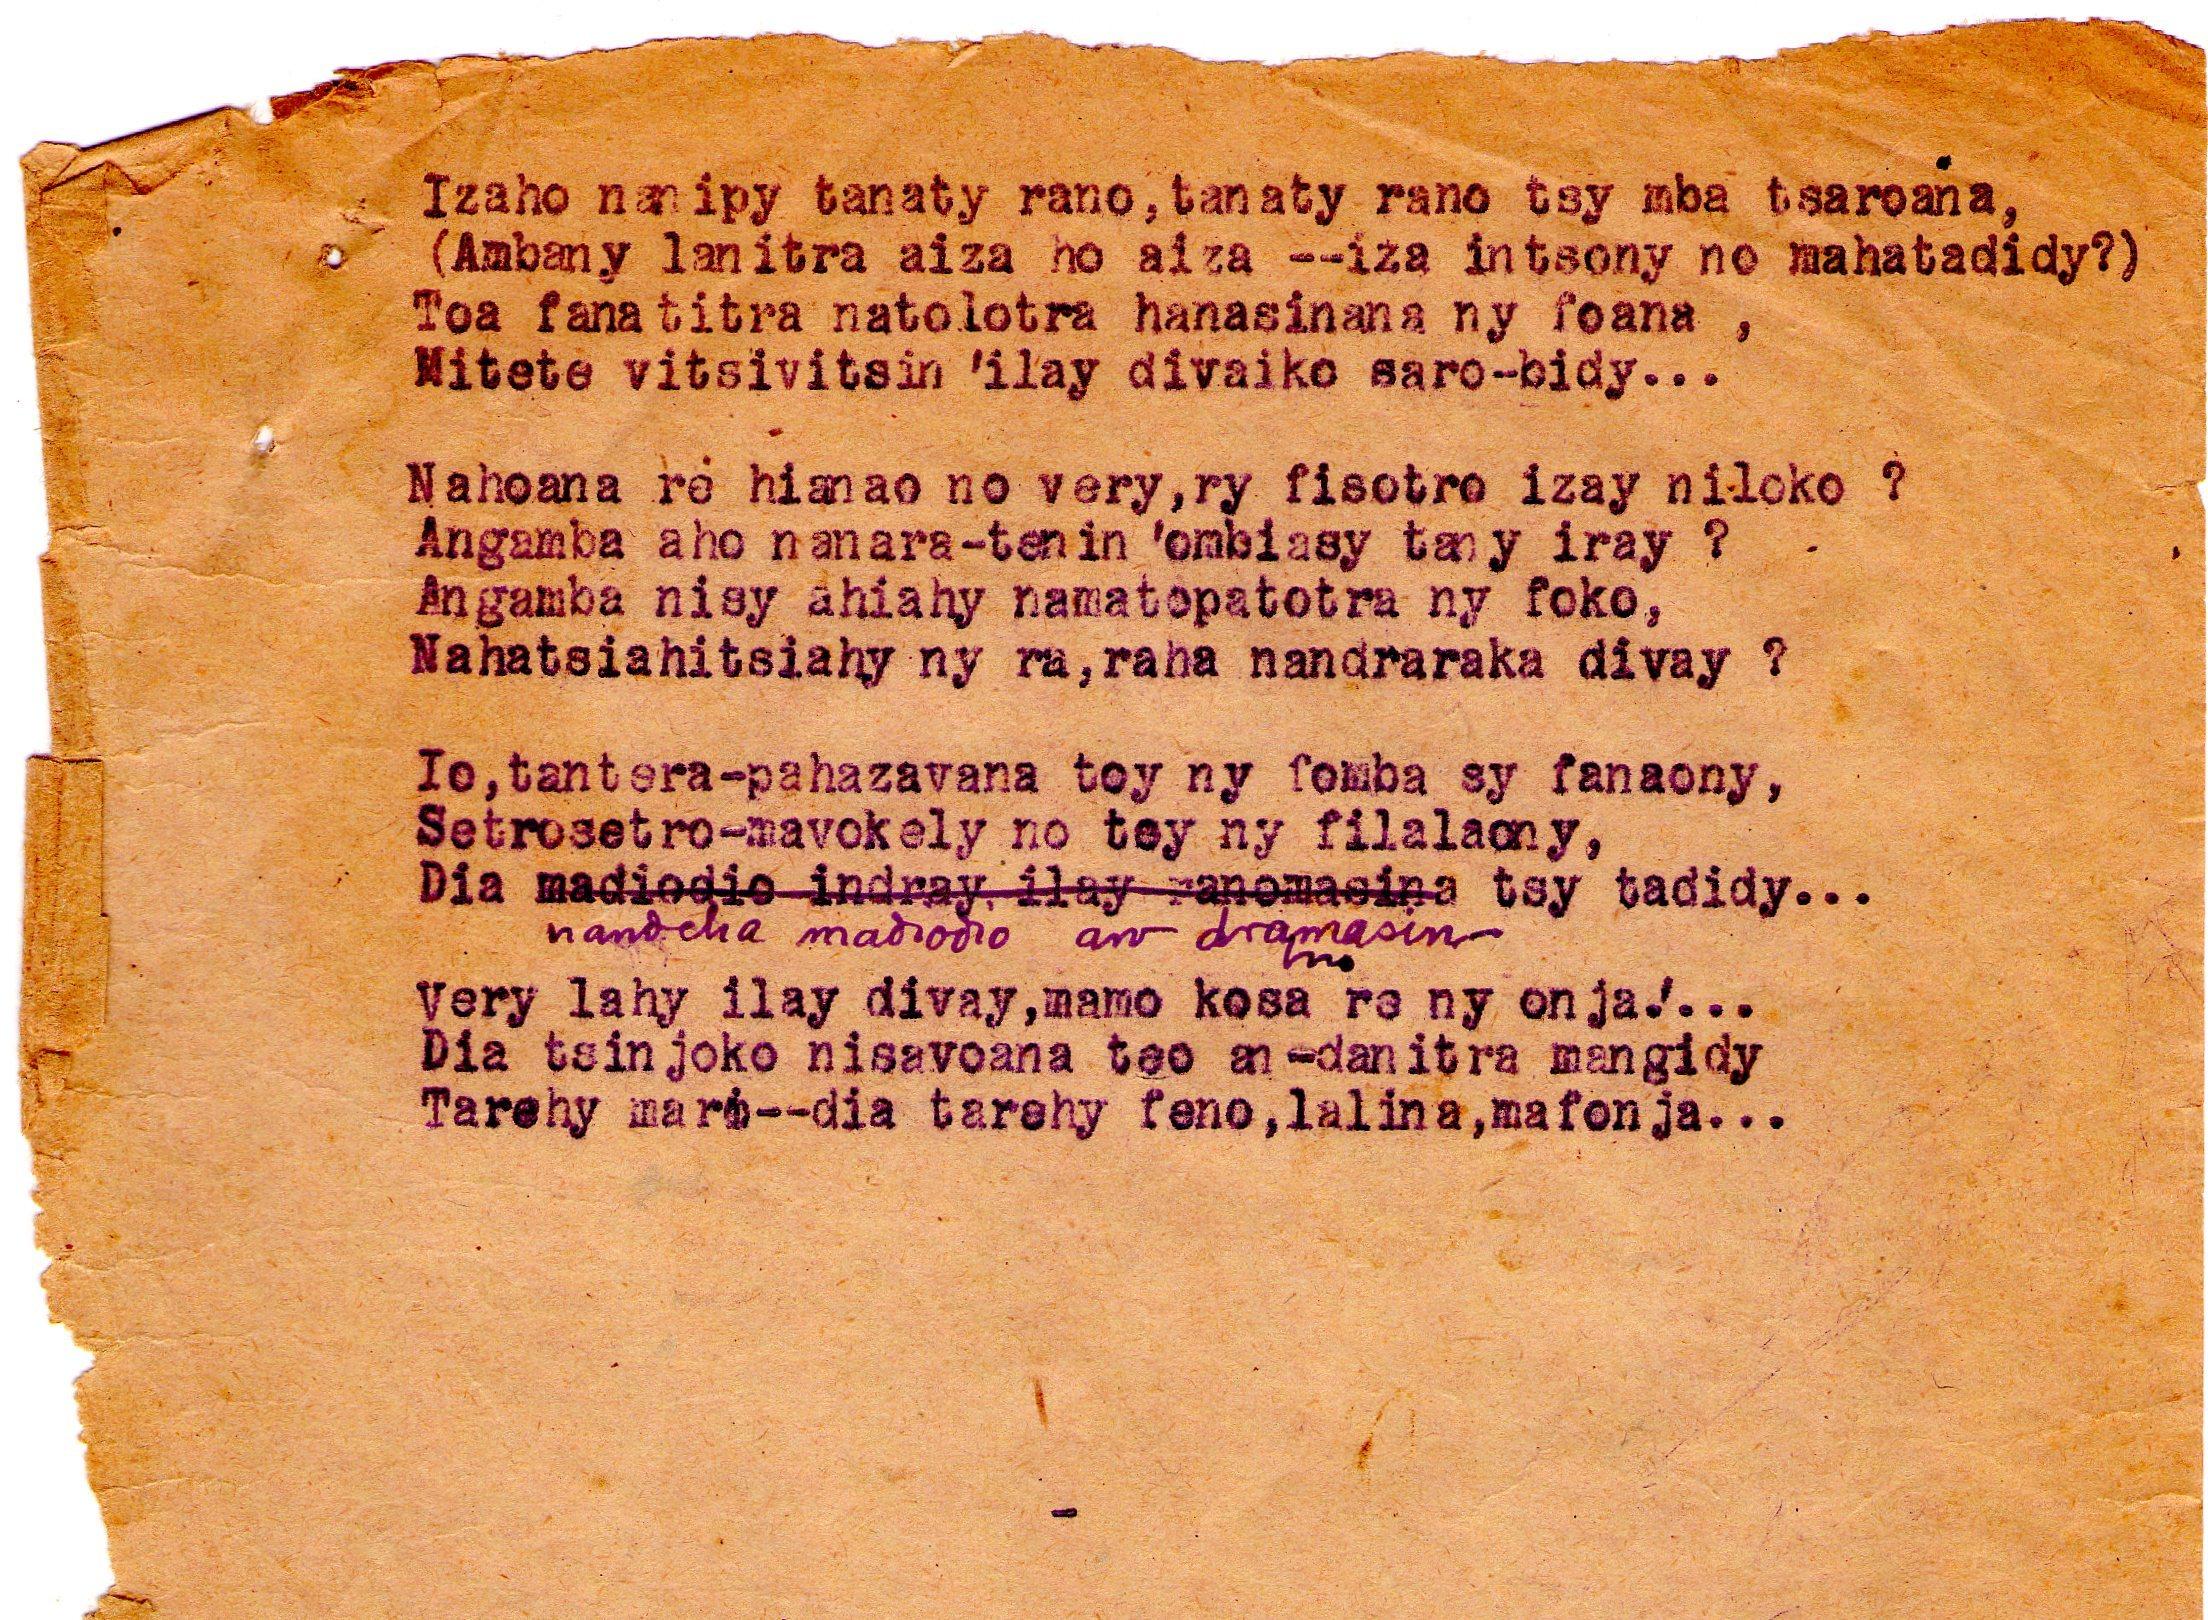 NUM TRAD MAN1 Traductions 2 1.jpg